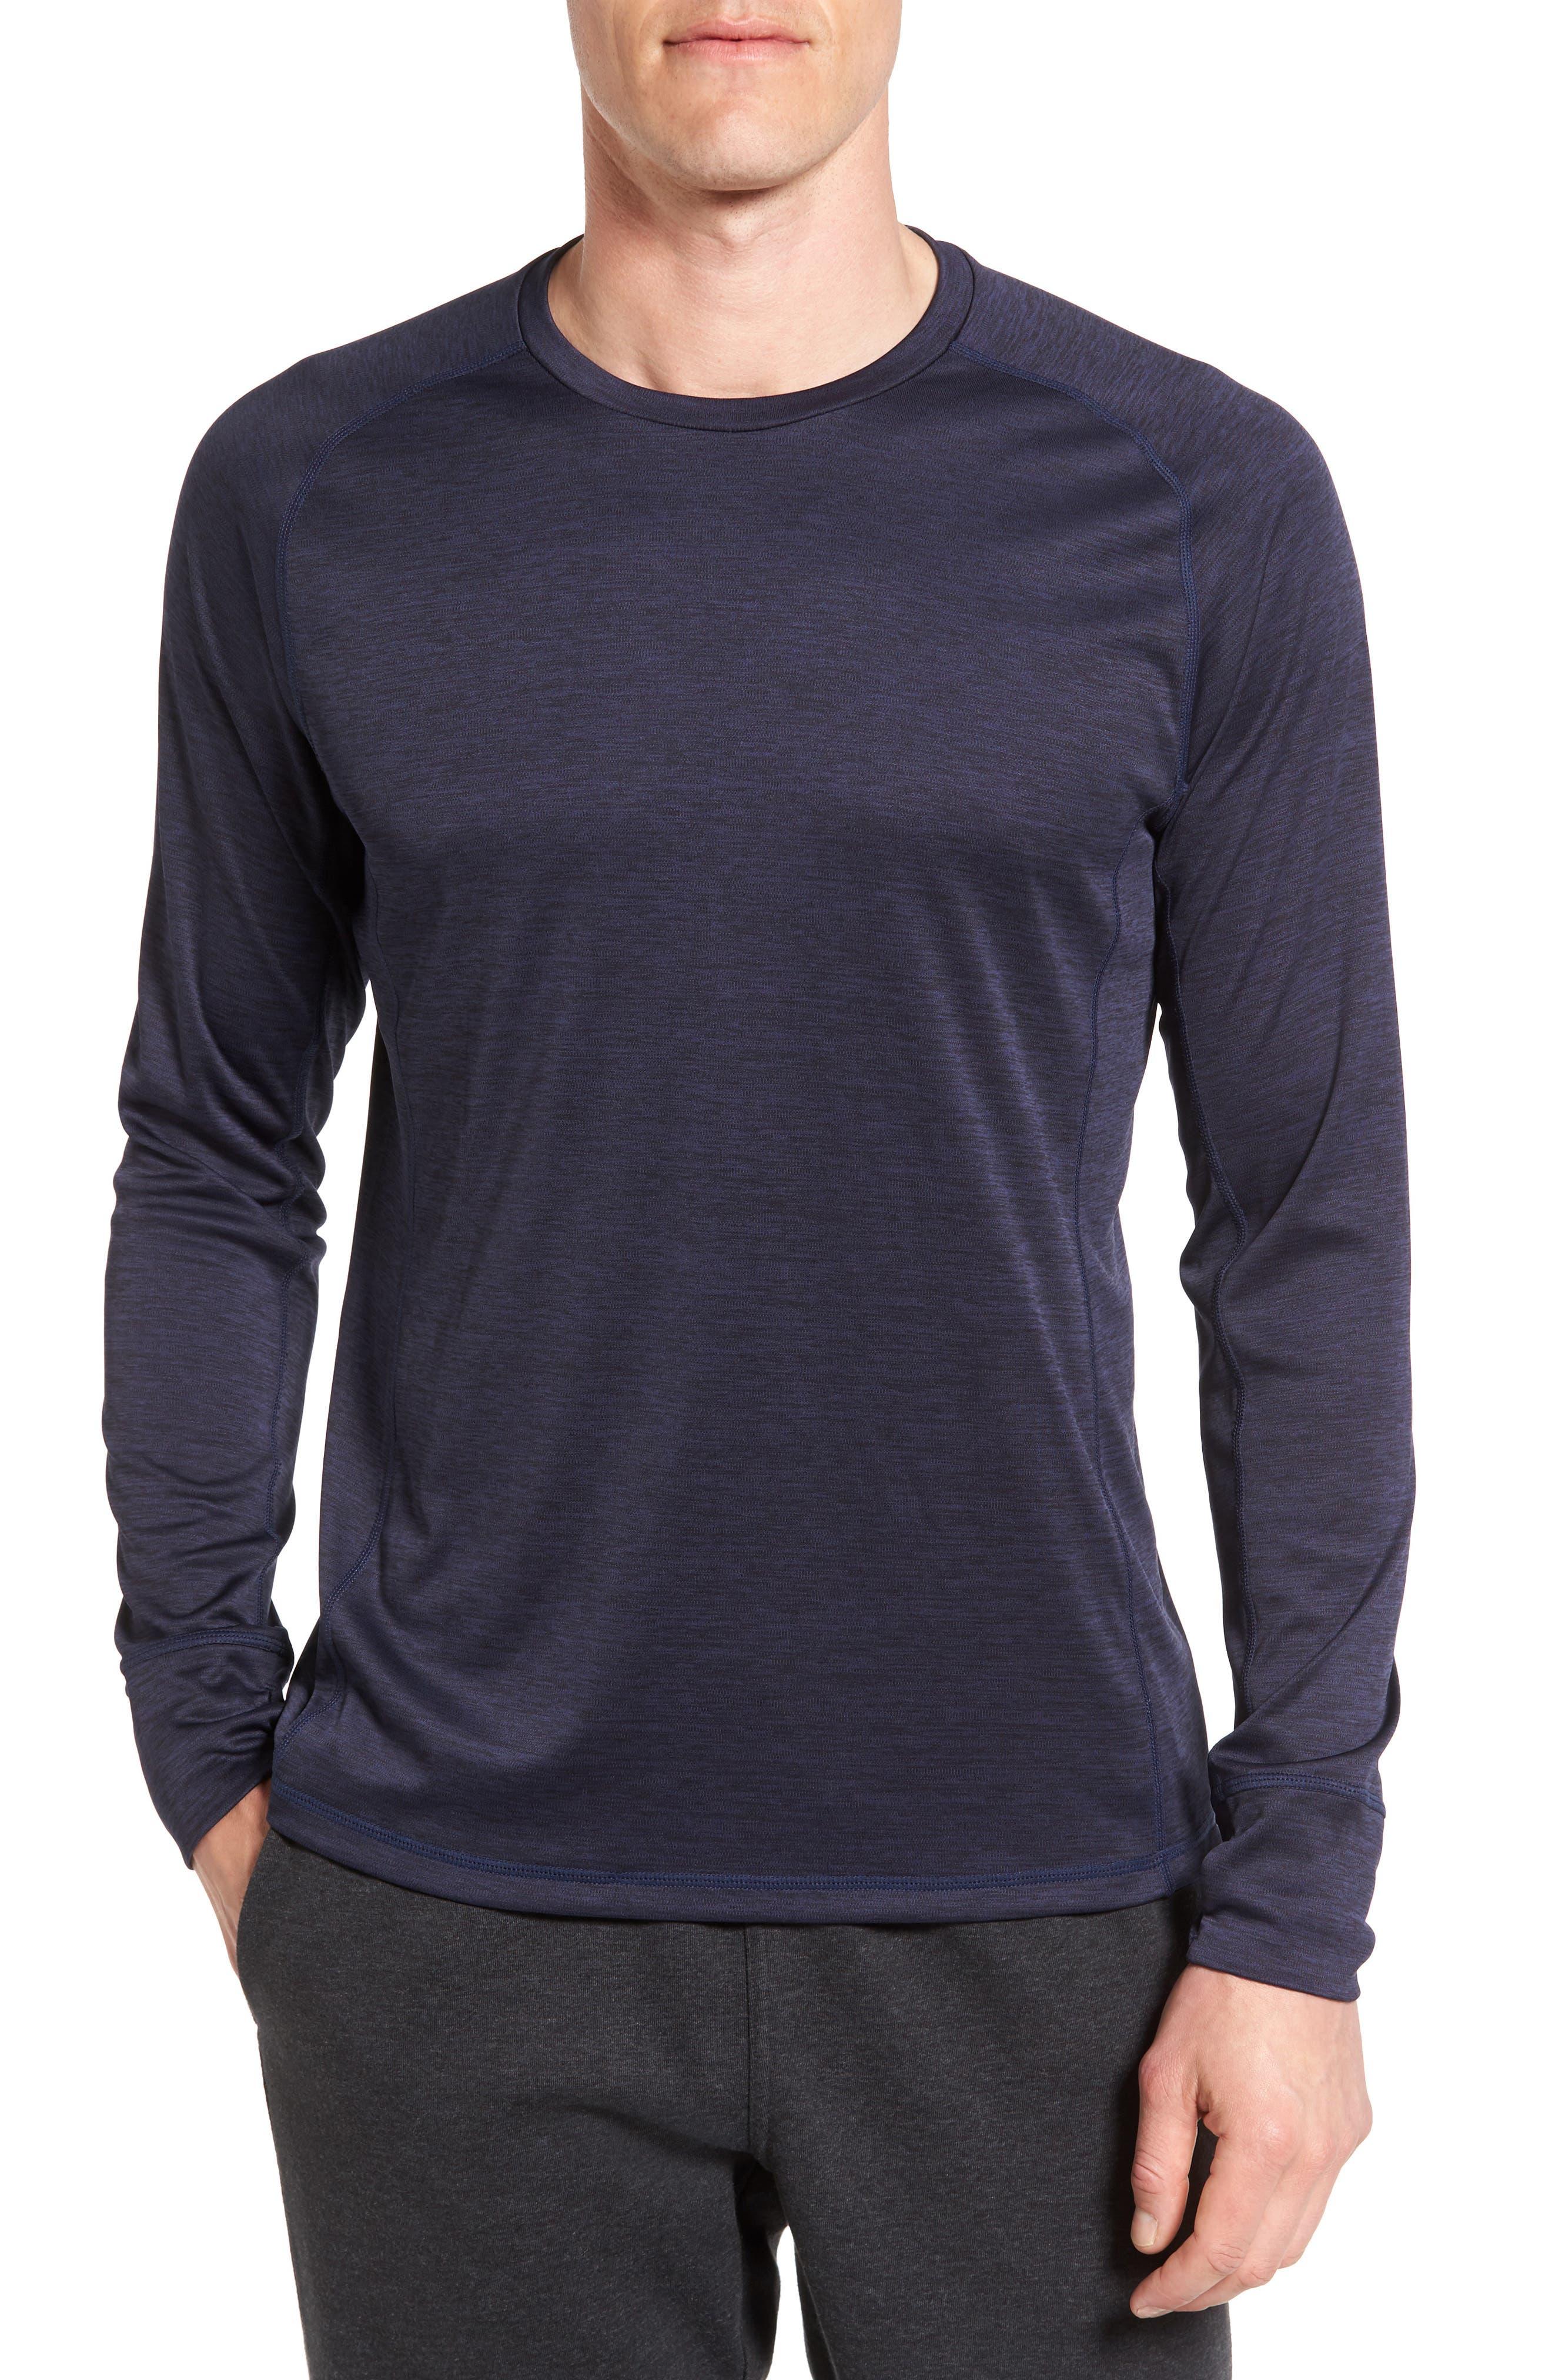 Main Image - Zella Triplite Long Sleeve T-Shirt